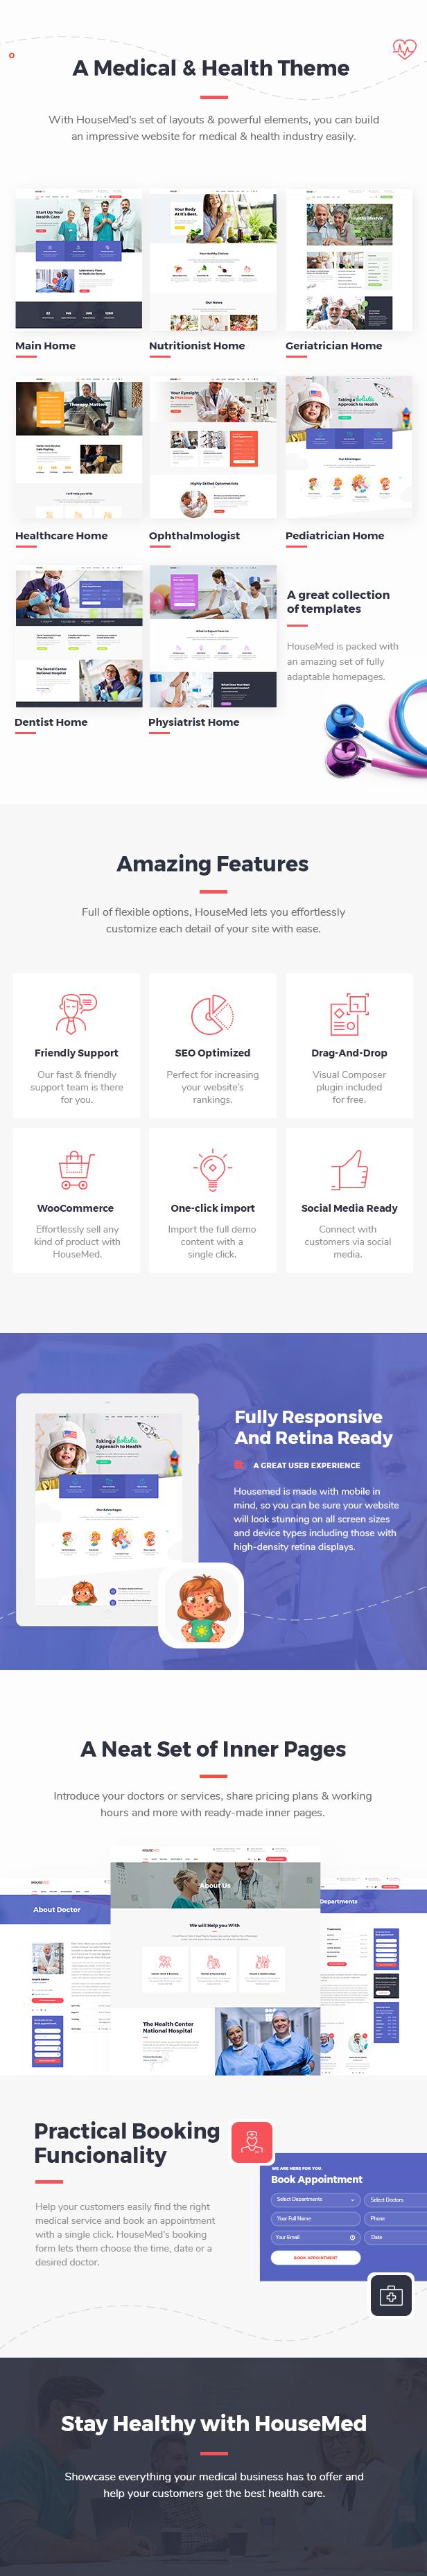 HouseMed - Multipurpose Medical and Health Theme - 1